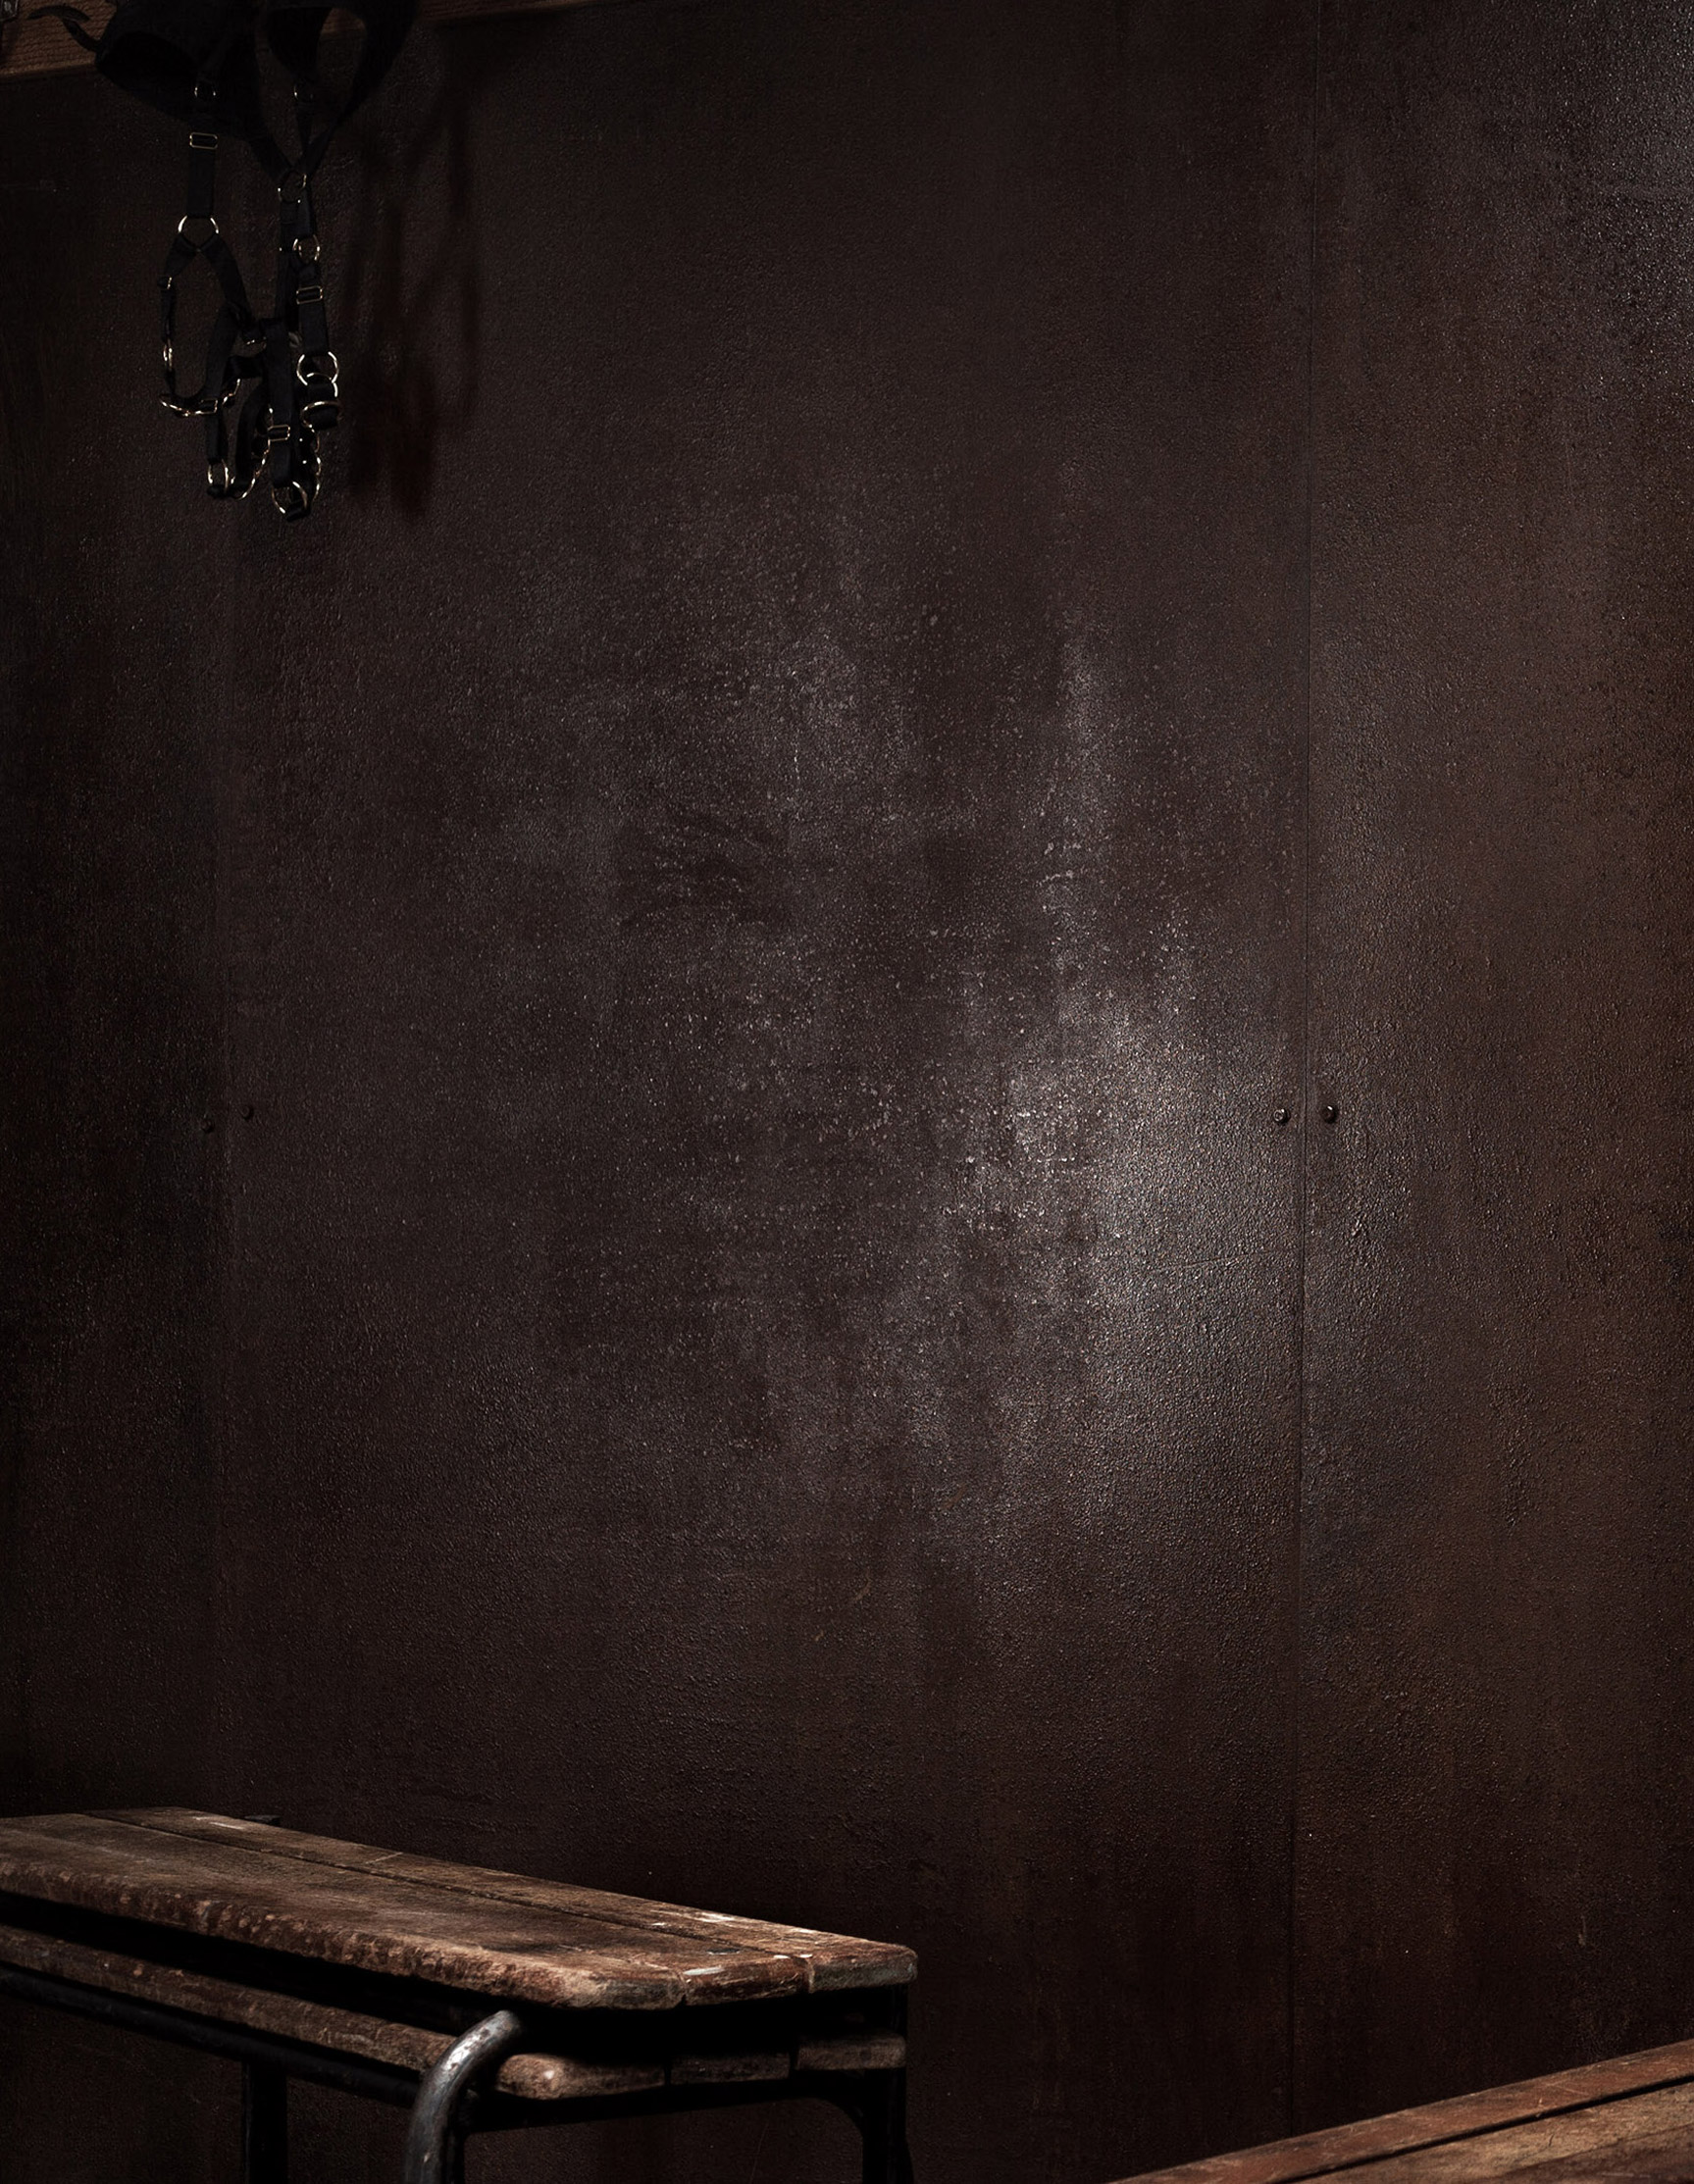 Aliane Uwimana Gatabazi, Mariame Sakanoko, Deborah Kadillac Ndimanyi, Aline Kittiphanh - Cloak Room by Martial Lenoir / Treats Magazine summer 2016